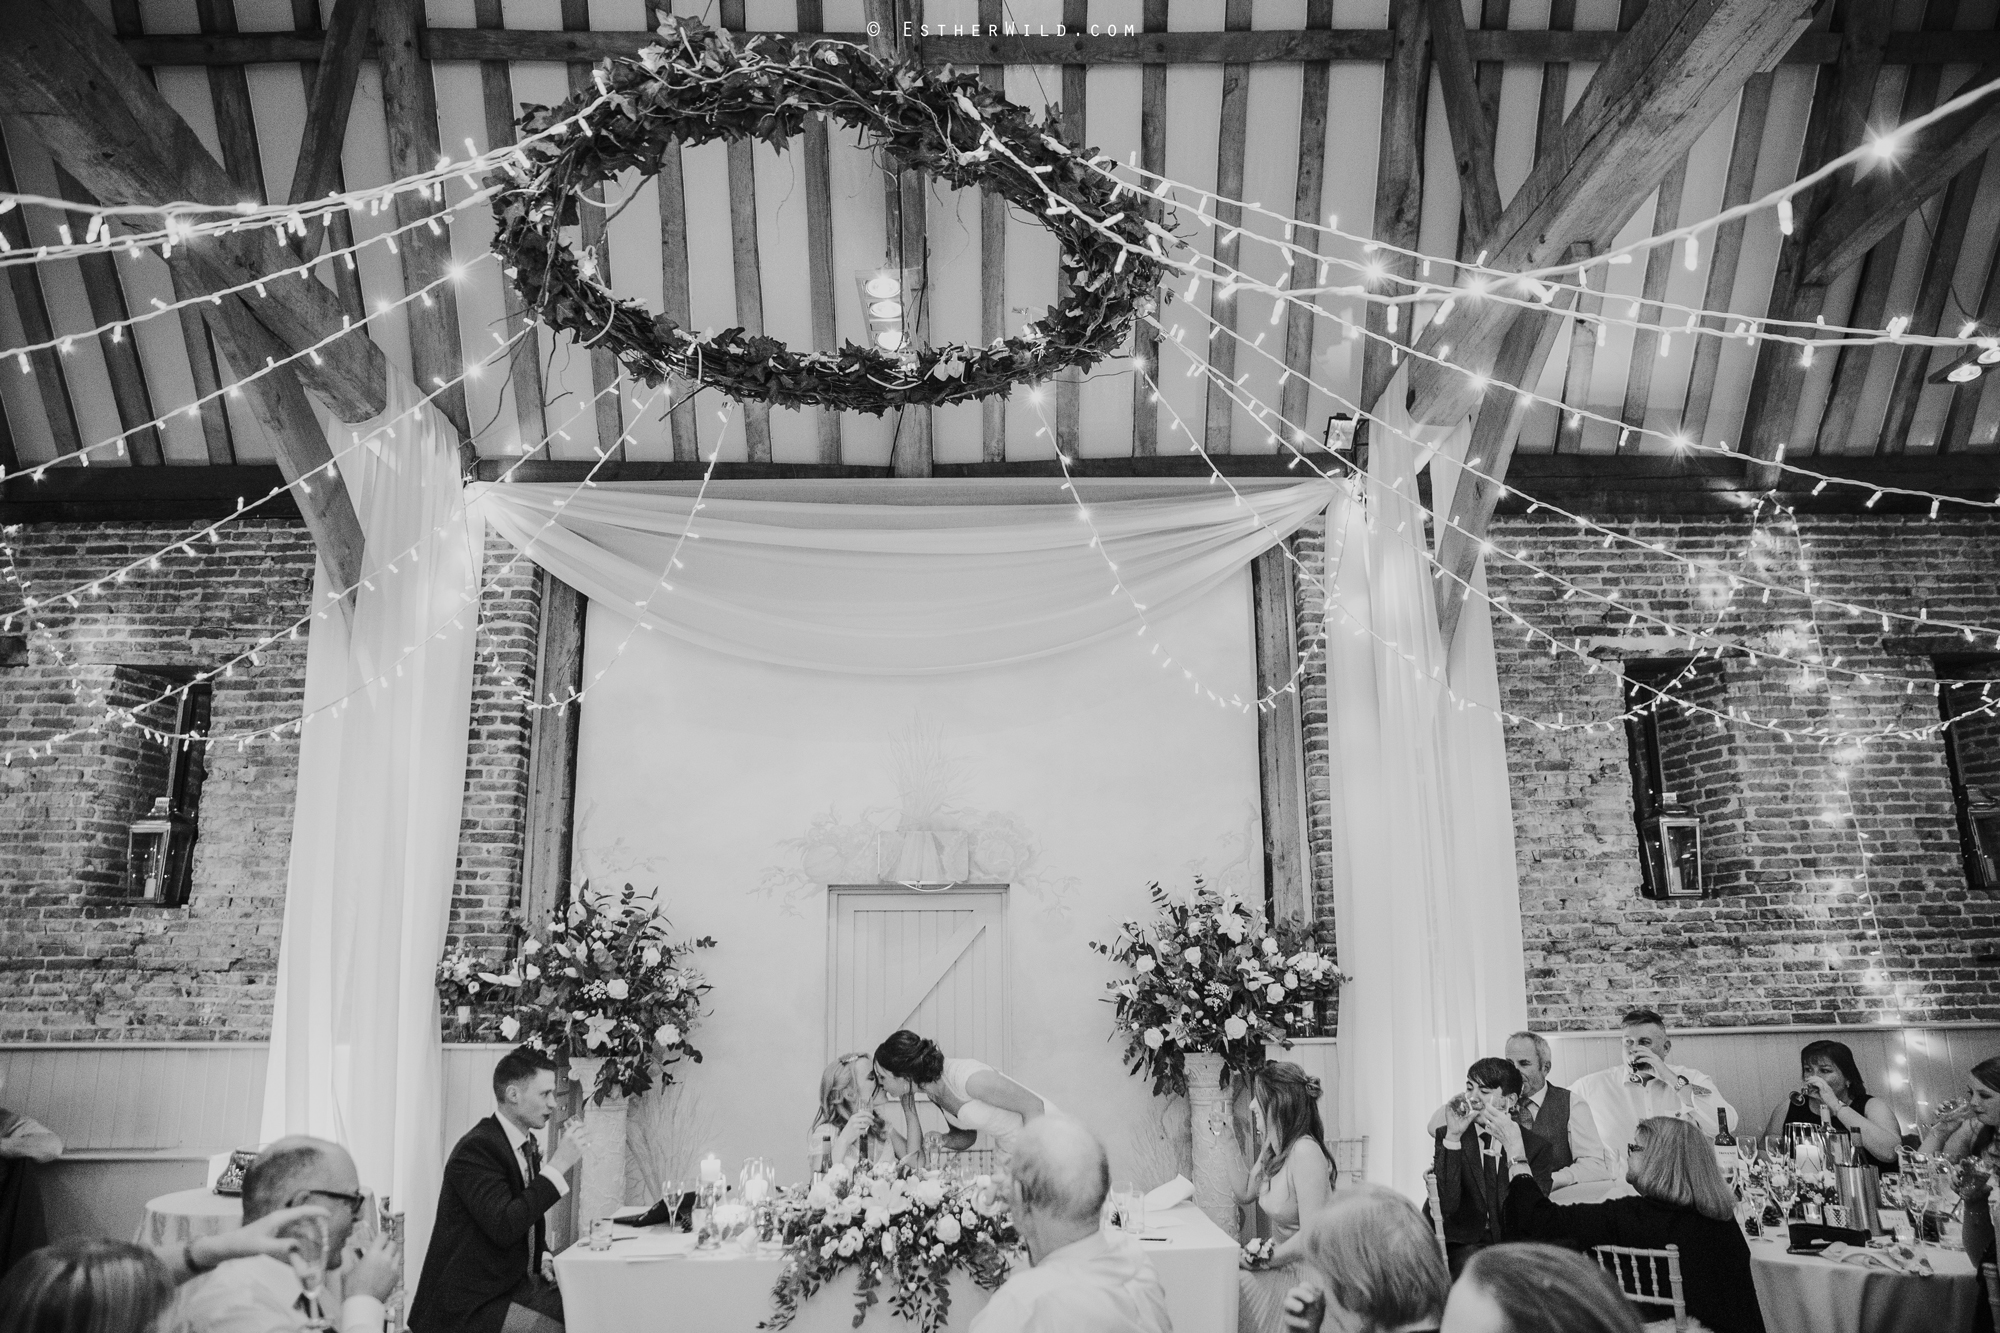 Elms_Barn_Weddings_Suffolk_Photographer_Copyright_Esther_Wild_IMG_2803-2.jpg